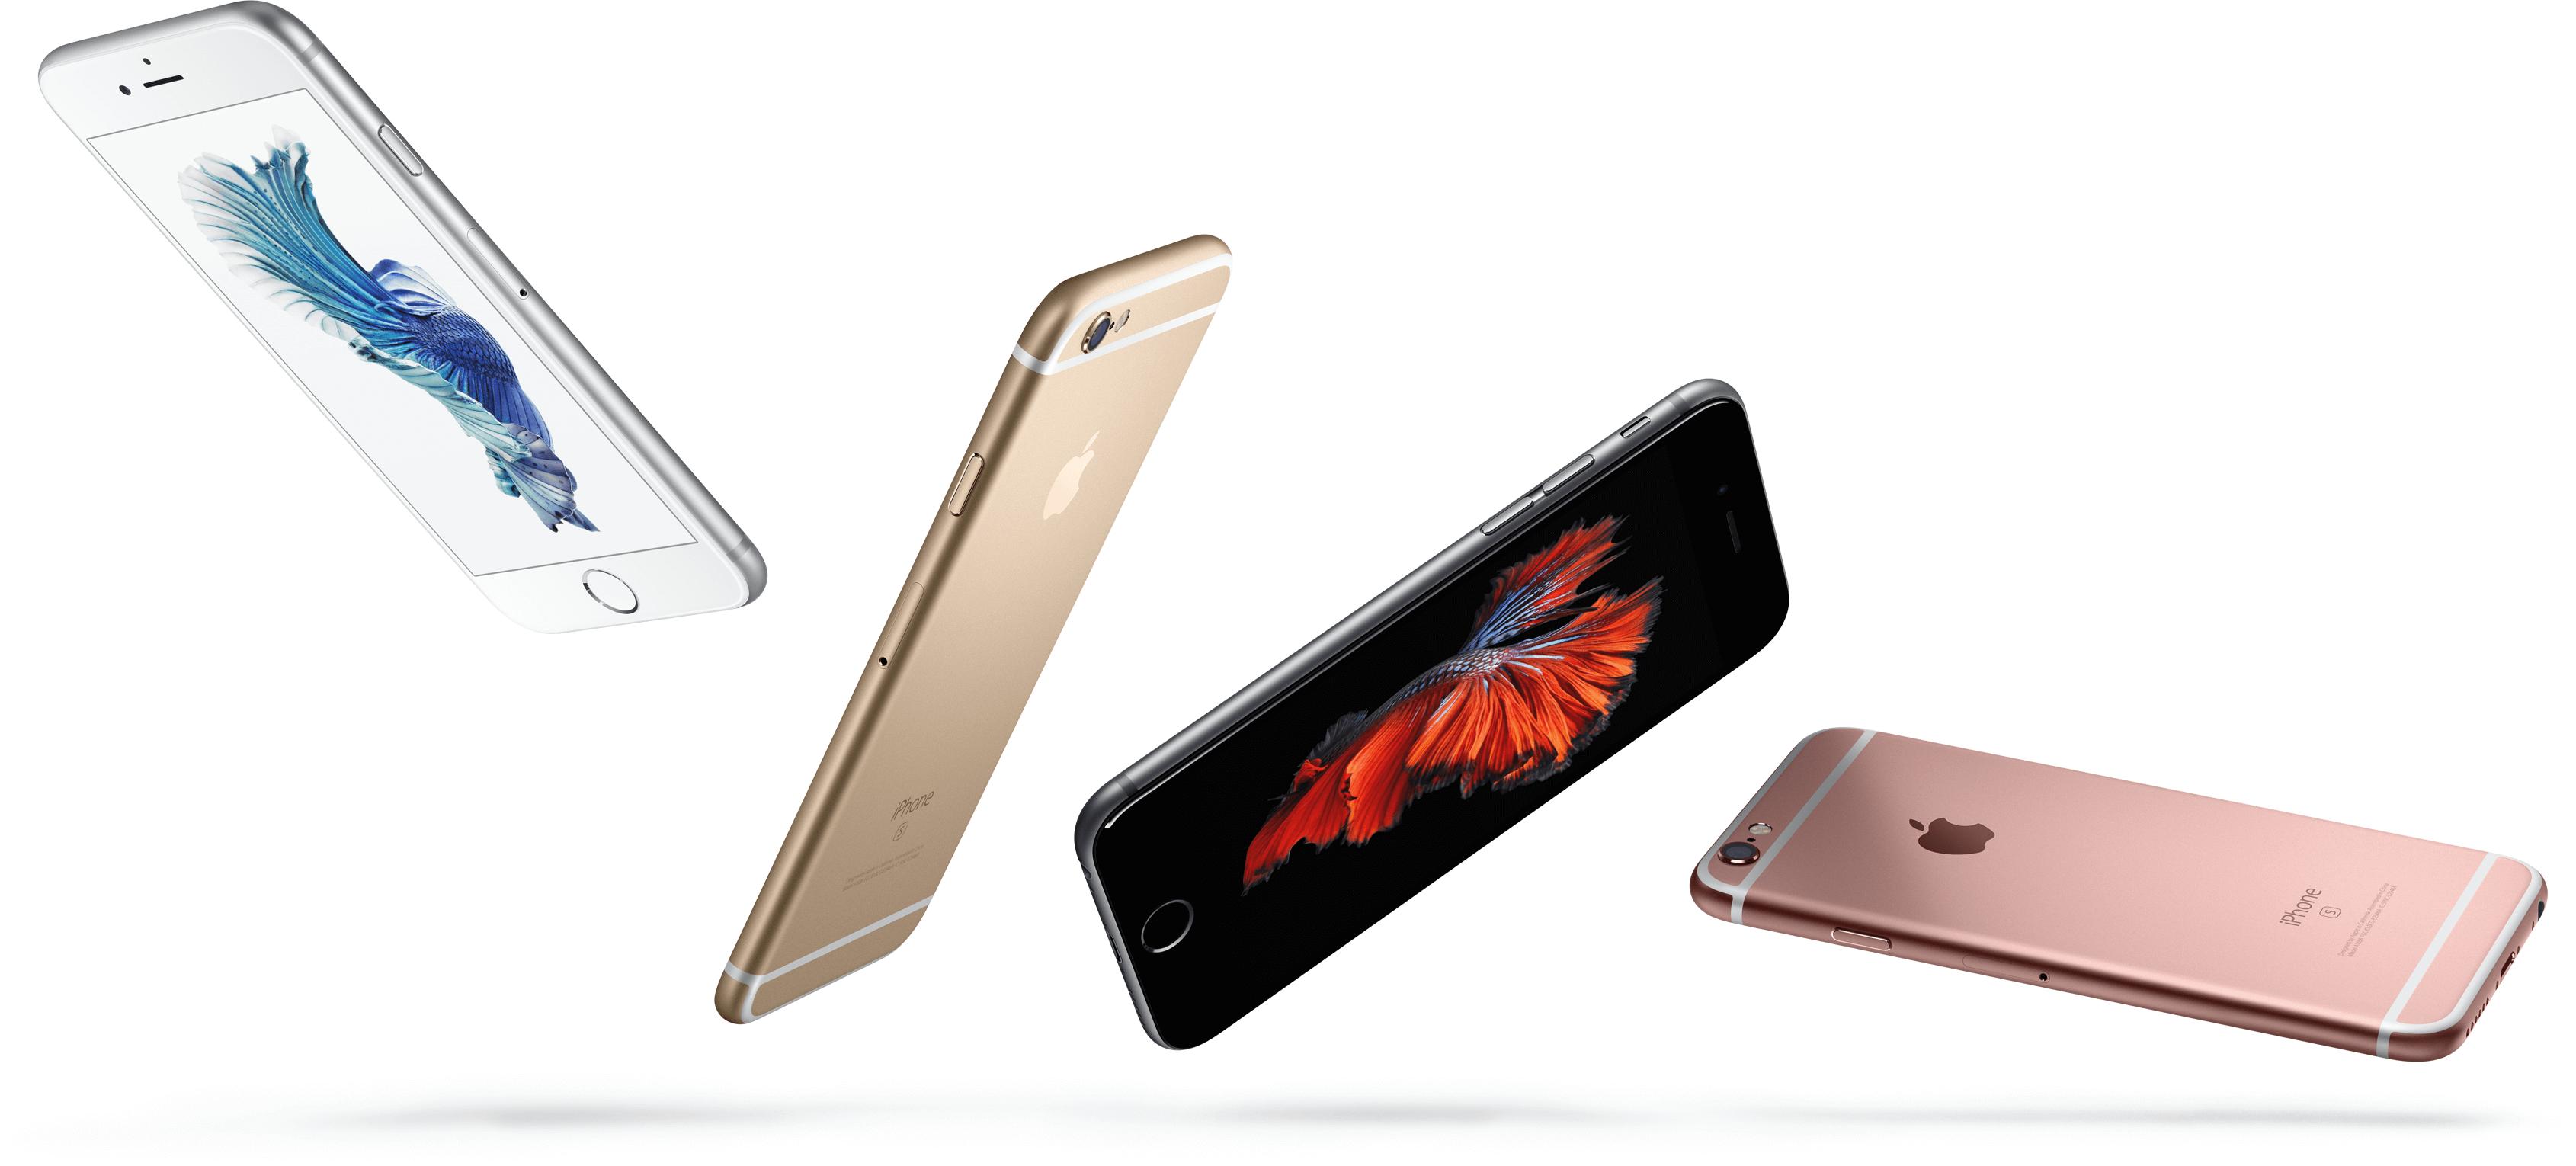 iPhone 6s разных цветов